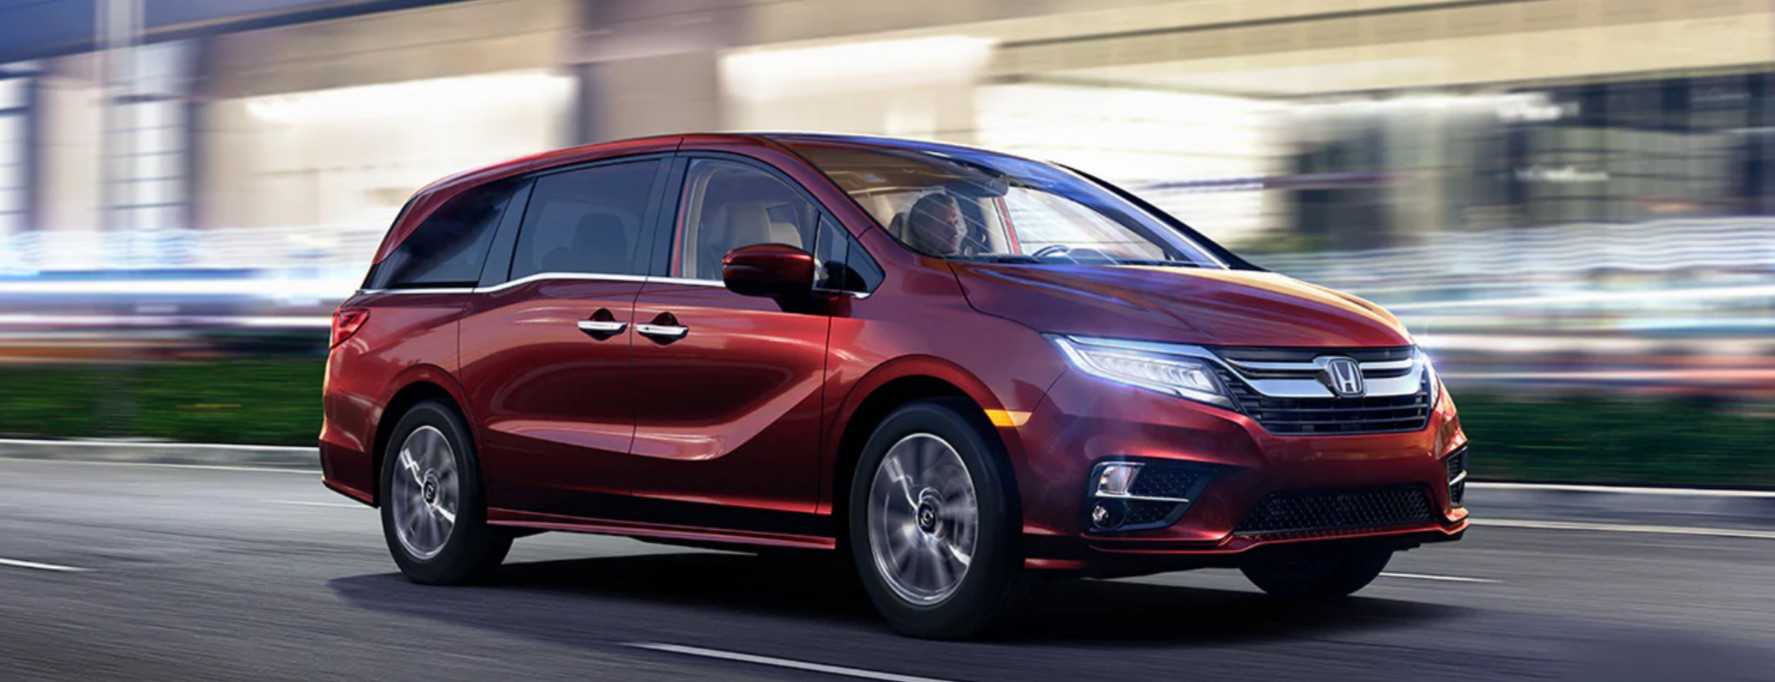 2020 Honda Odyssey Leasing near Washington, DC